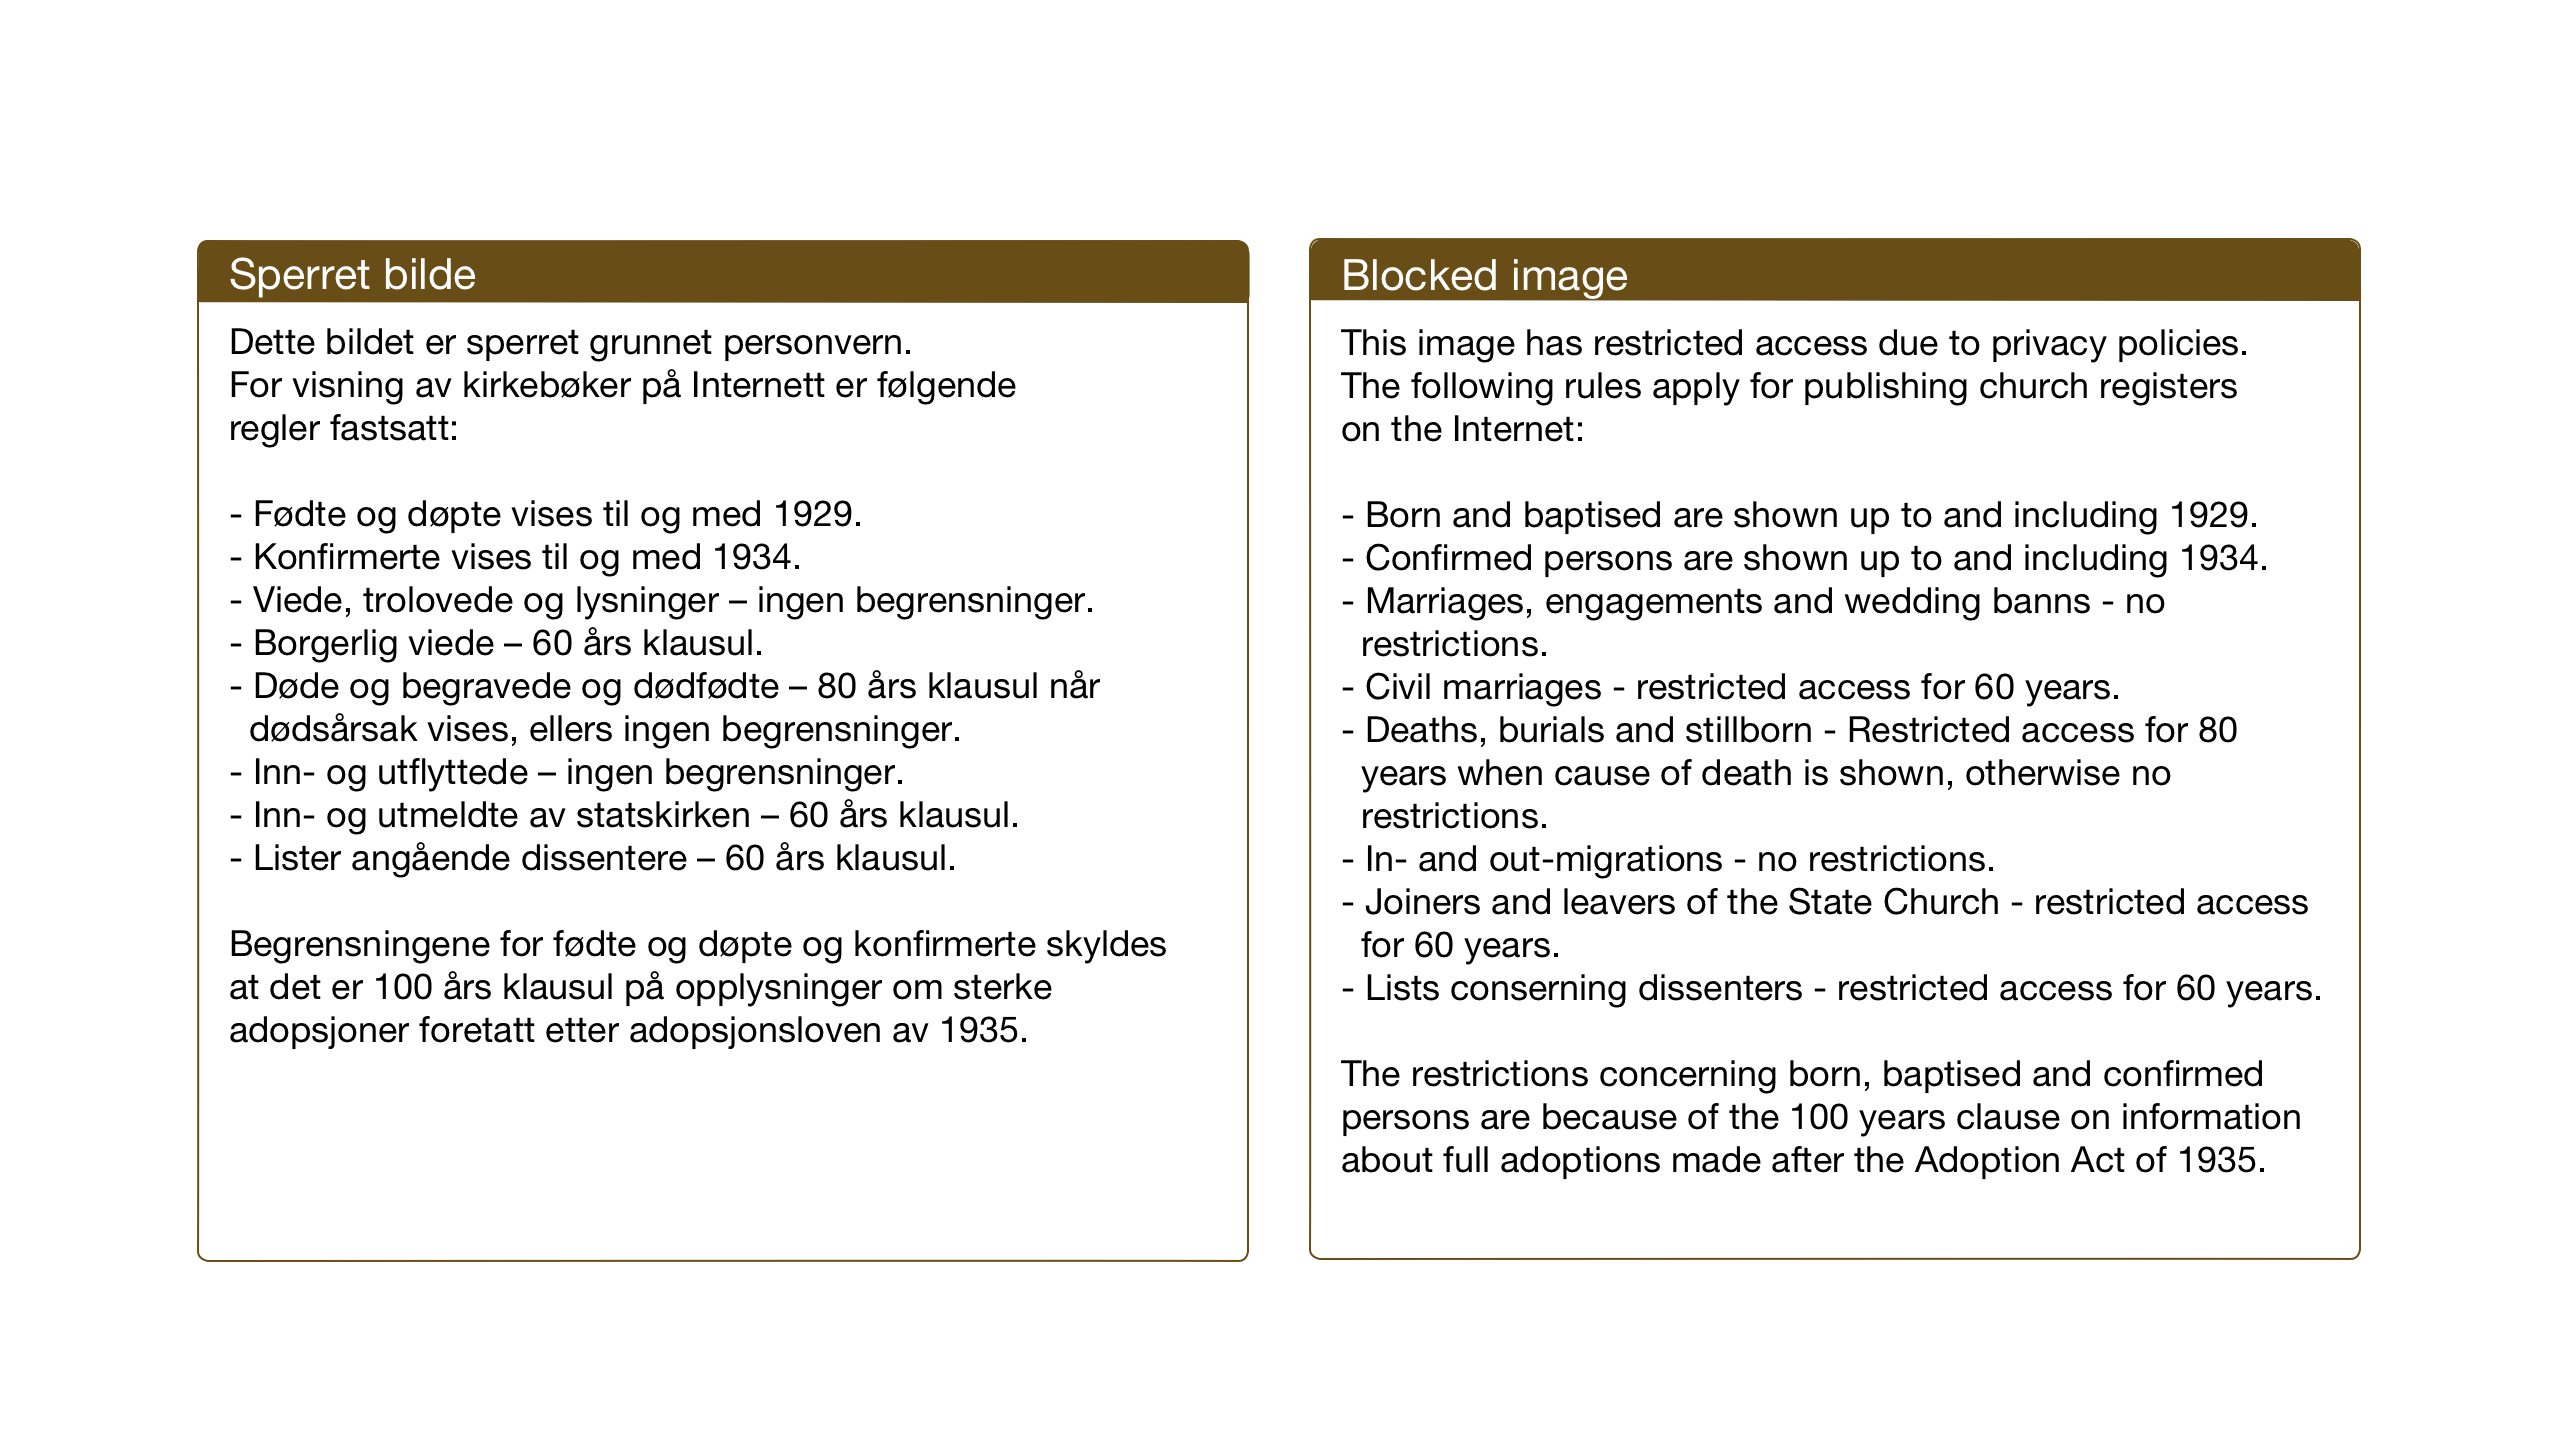 SAH, Lunner prestekontor, H/Ha/Haa/L0002: Ministerialbok nr. 2, 1922-1931, s. 58